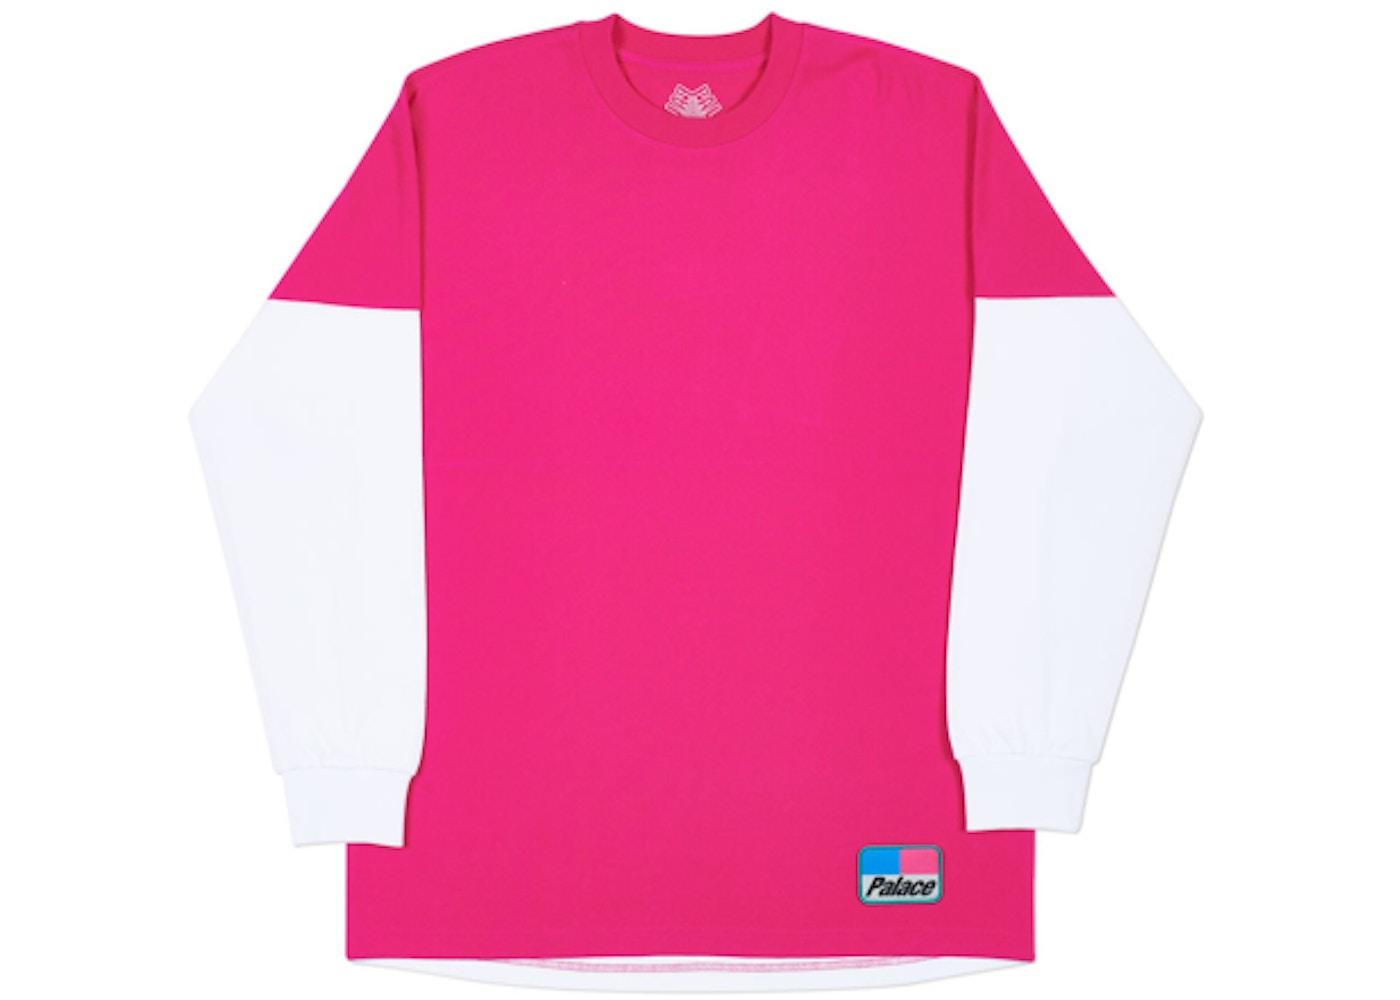 5d9df6e1 Palace Splitter Longsleeve Hot Pink/White - Spring 2018